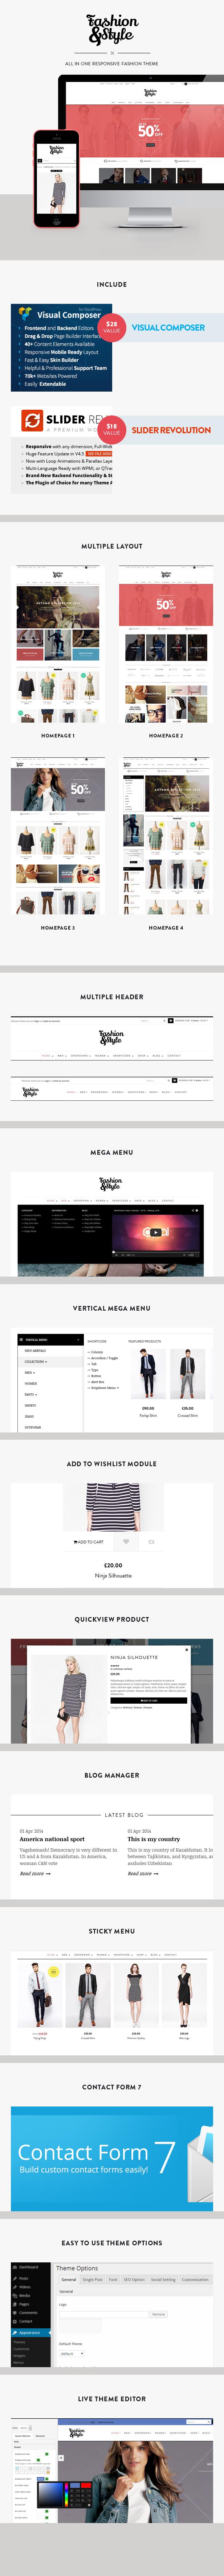 Fashion - WooCommerce Responsive WordPress Theme - 6